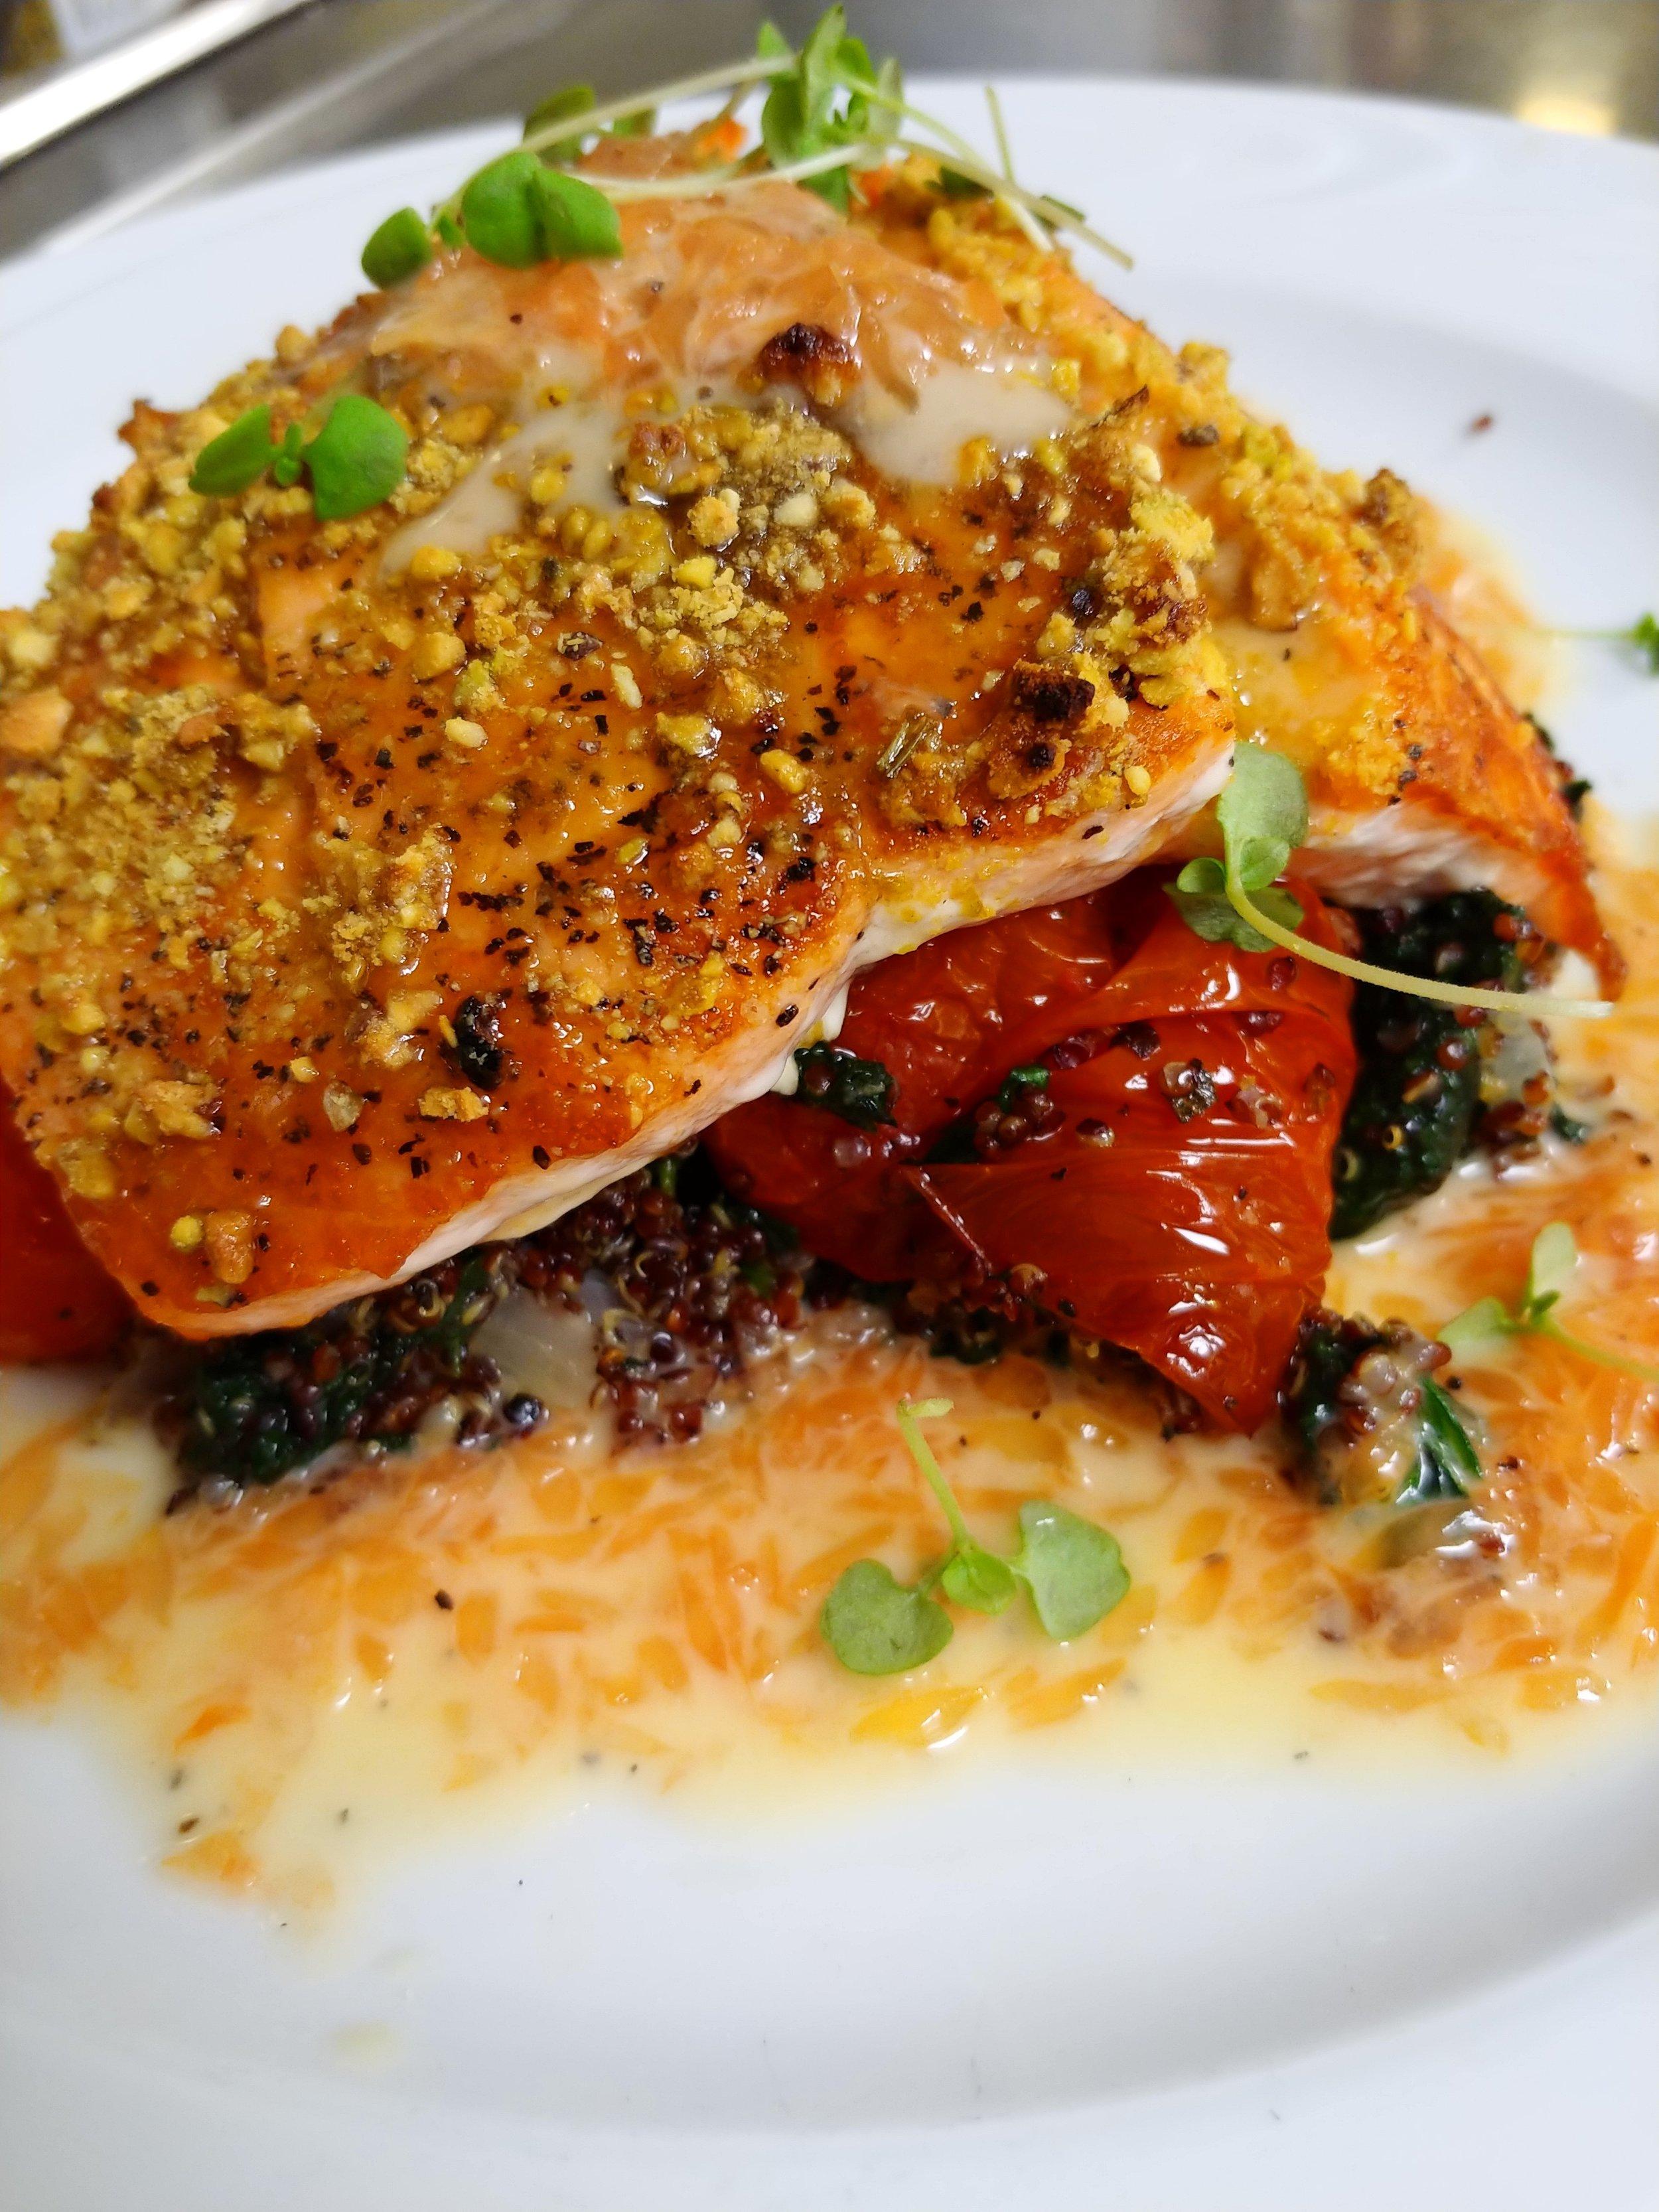 Pistachio Crusted Wild Alaskan Salmon